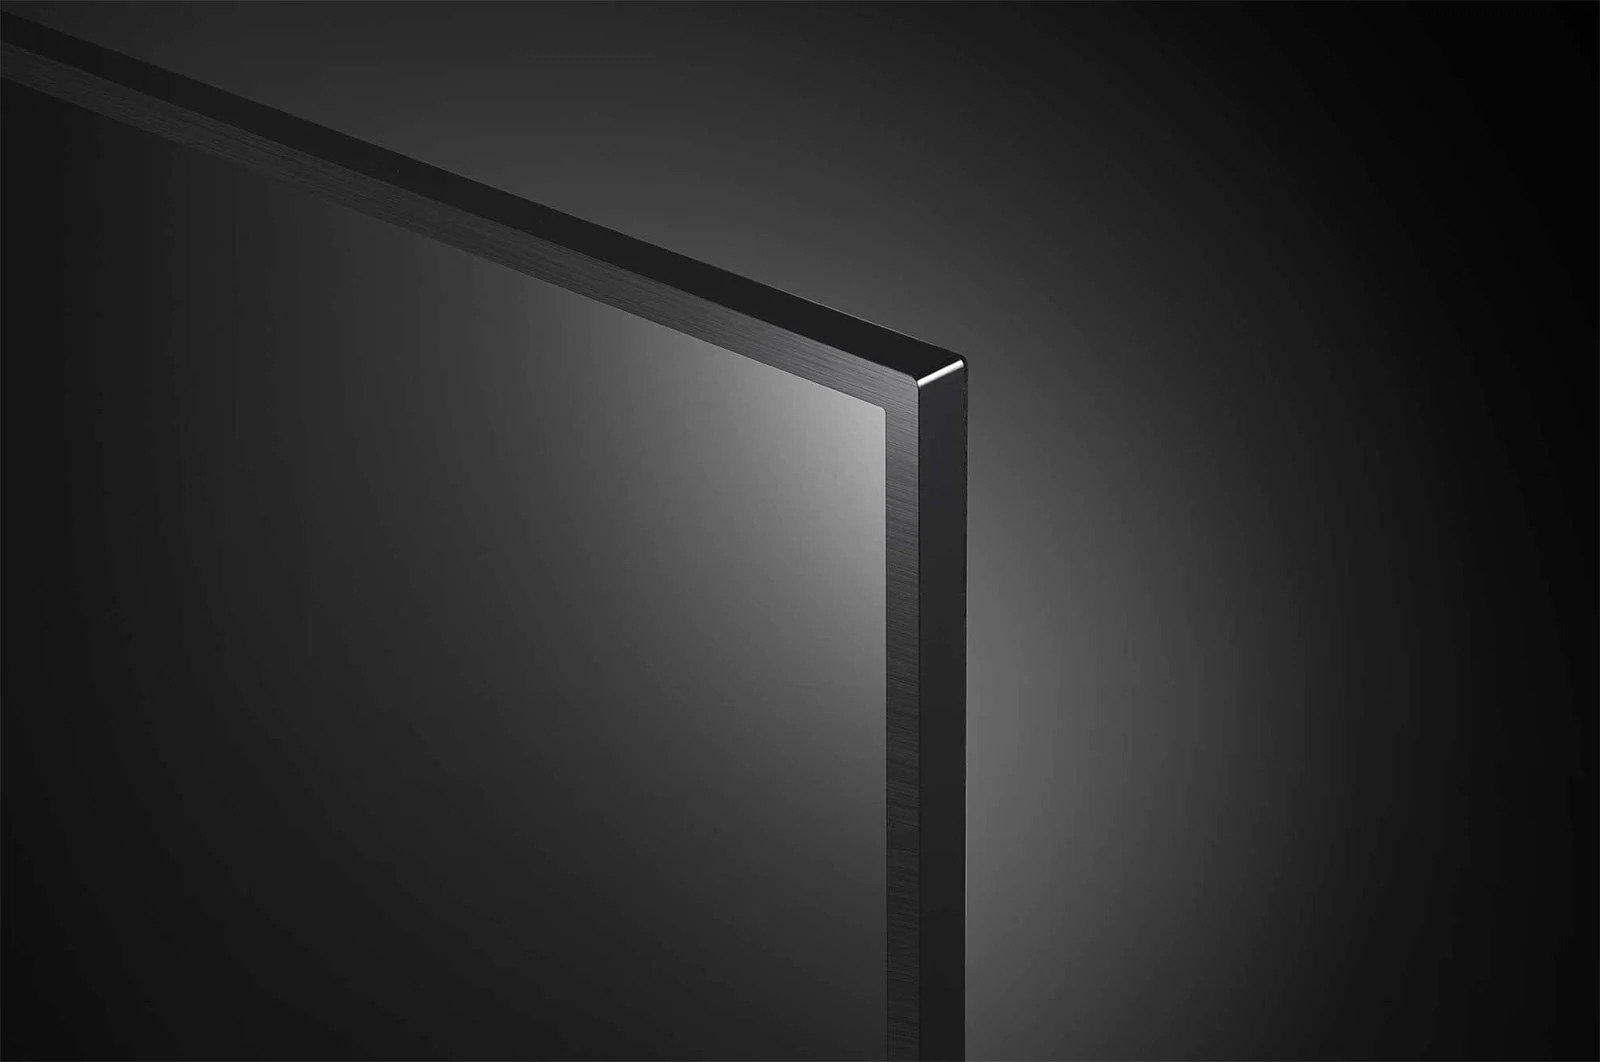 LG (55UN7300PTC) 55 (139.7cm) 4K Smart UHD TV